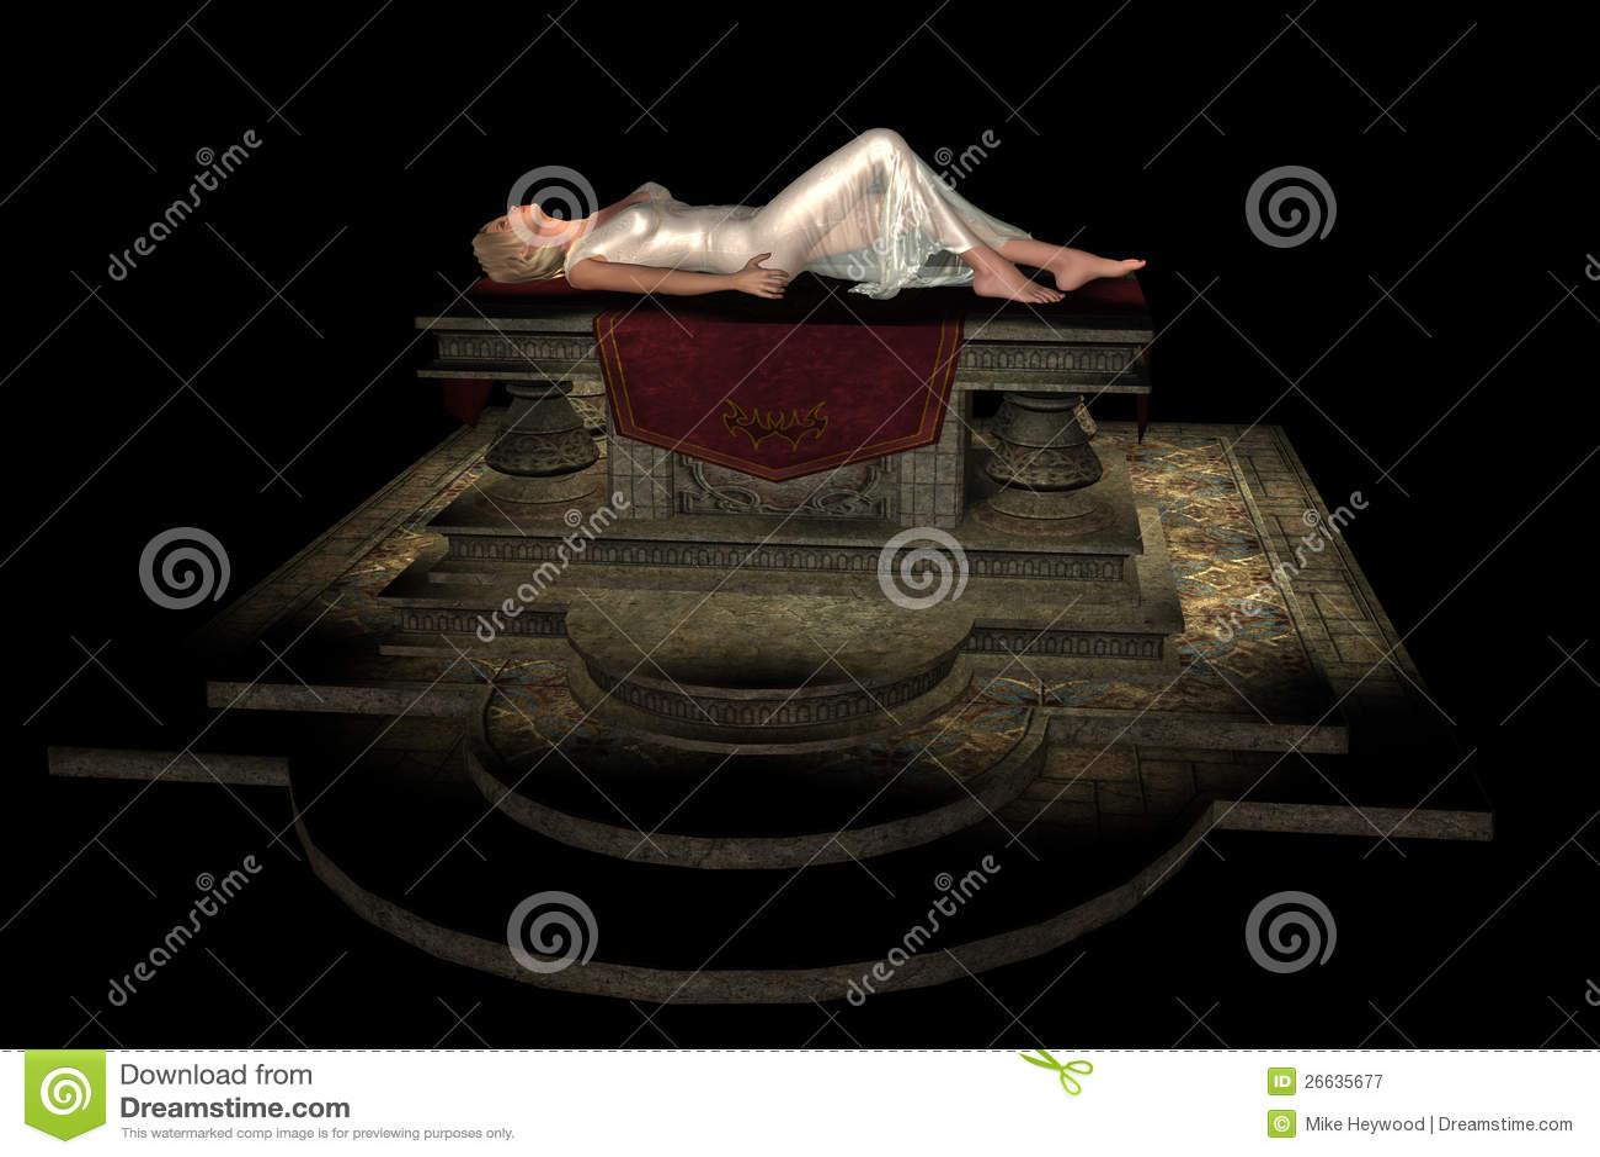 Female altar sacrifice porn pictures